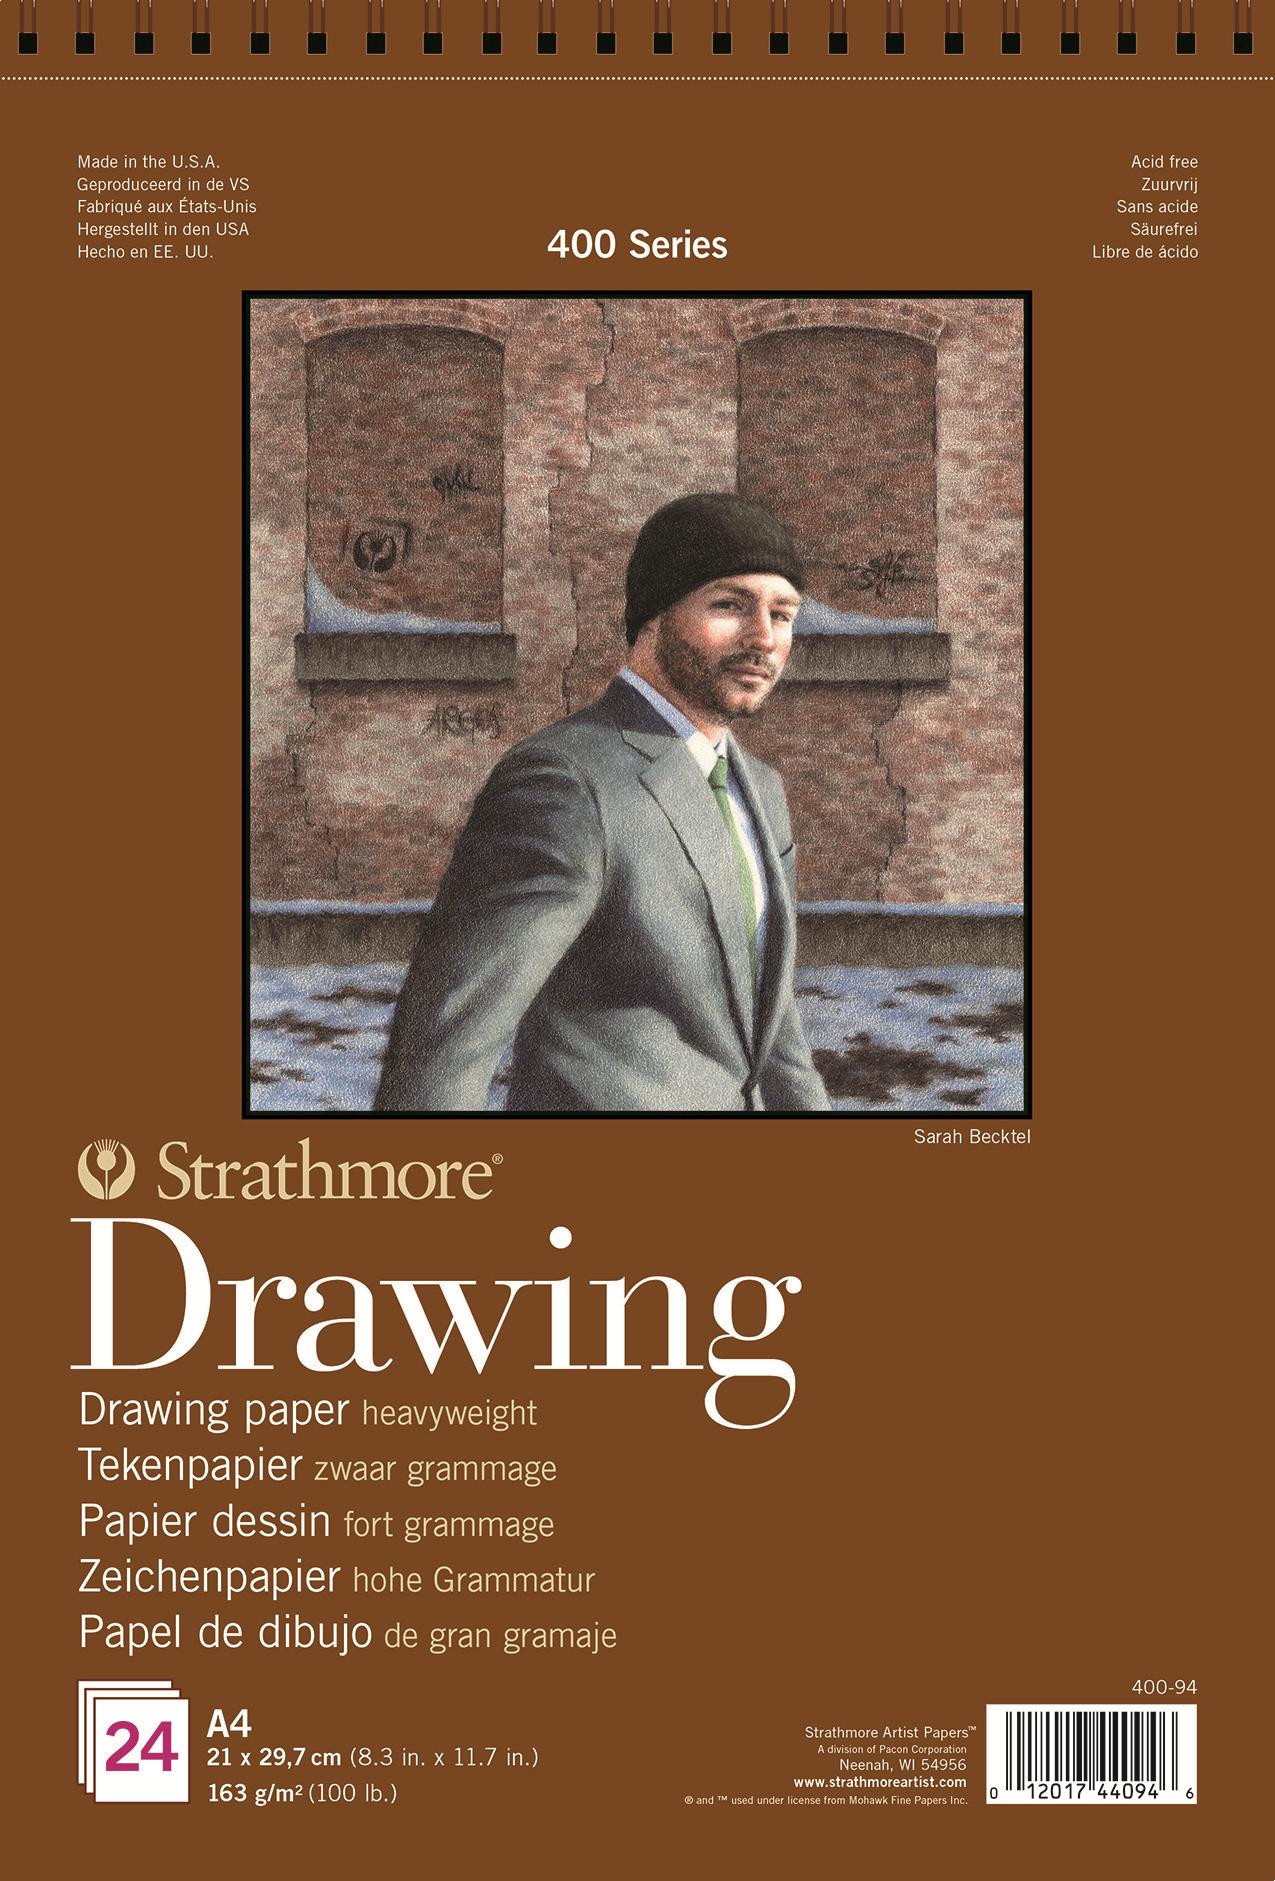 Strathmore Альбом для графики 400 Series 24 листа формат A4 -  Бумага и картон